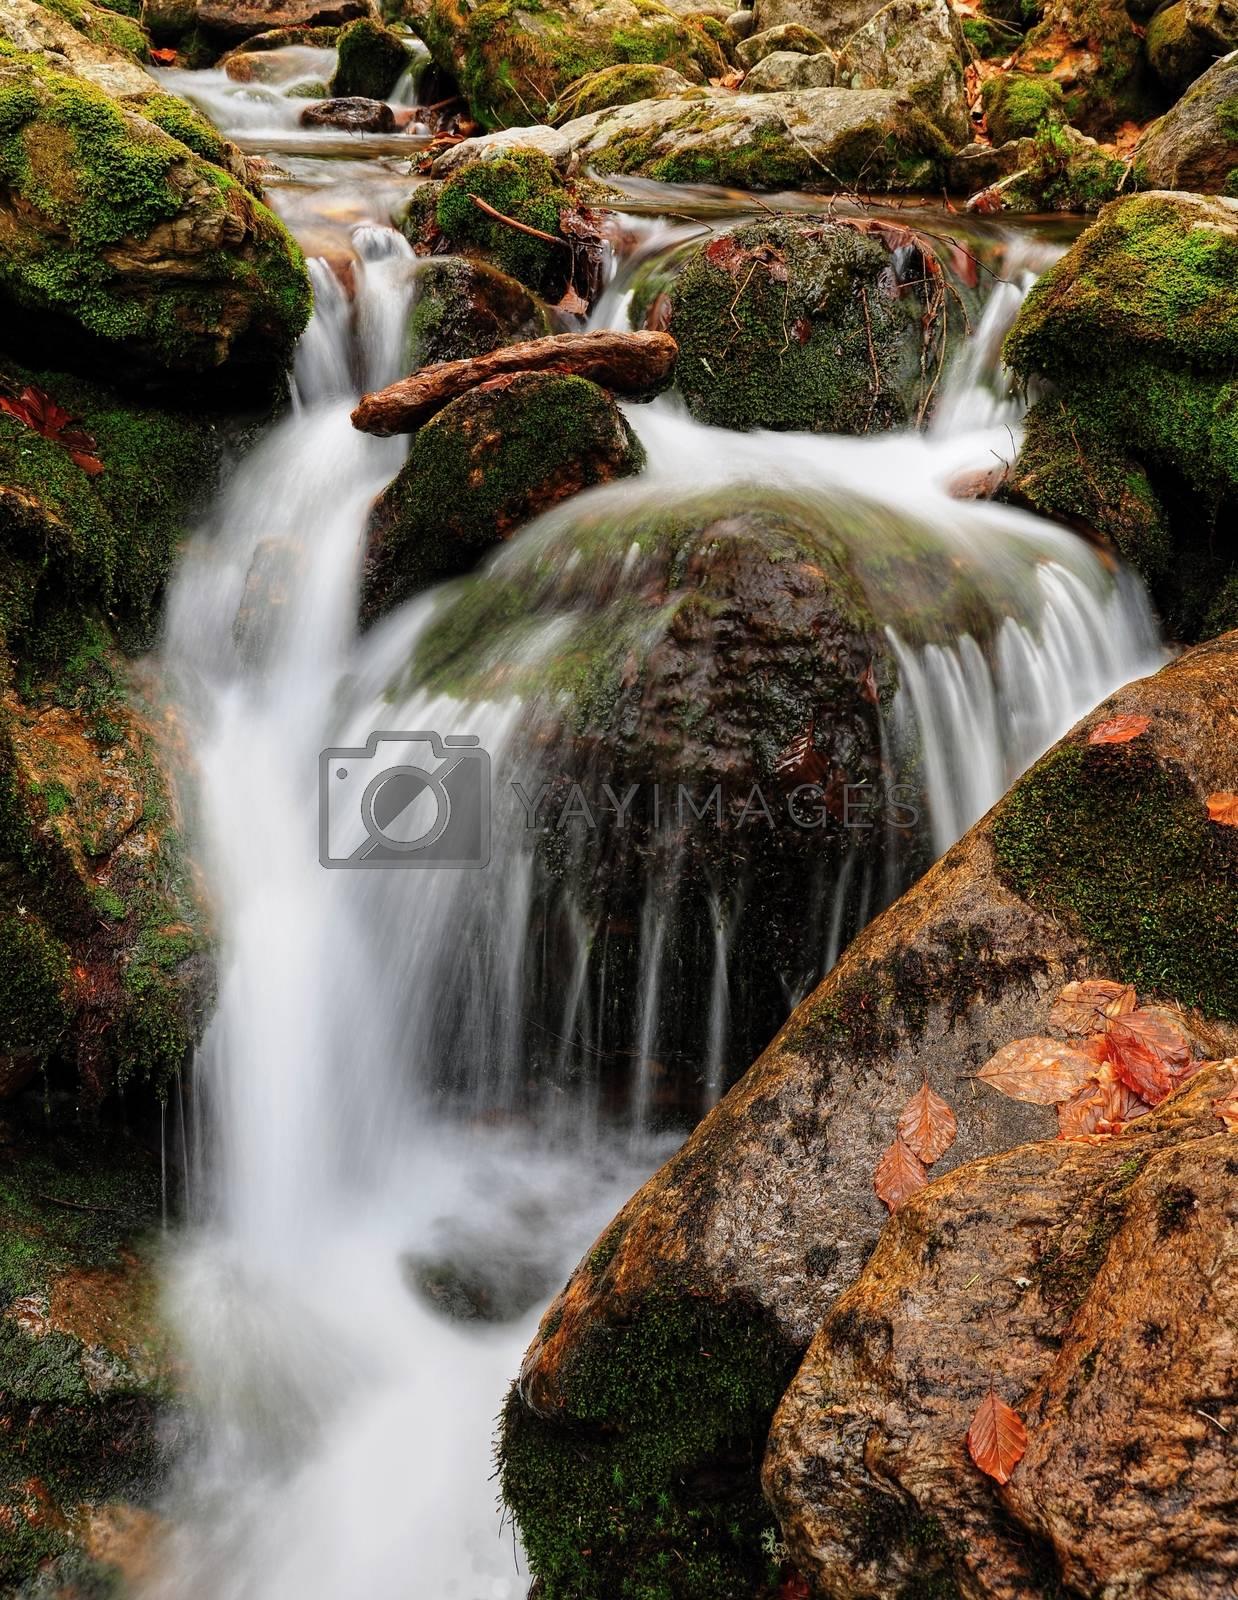 Royalty free image of Spring creek by ondrej83